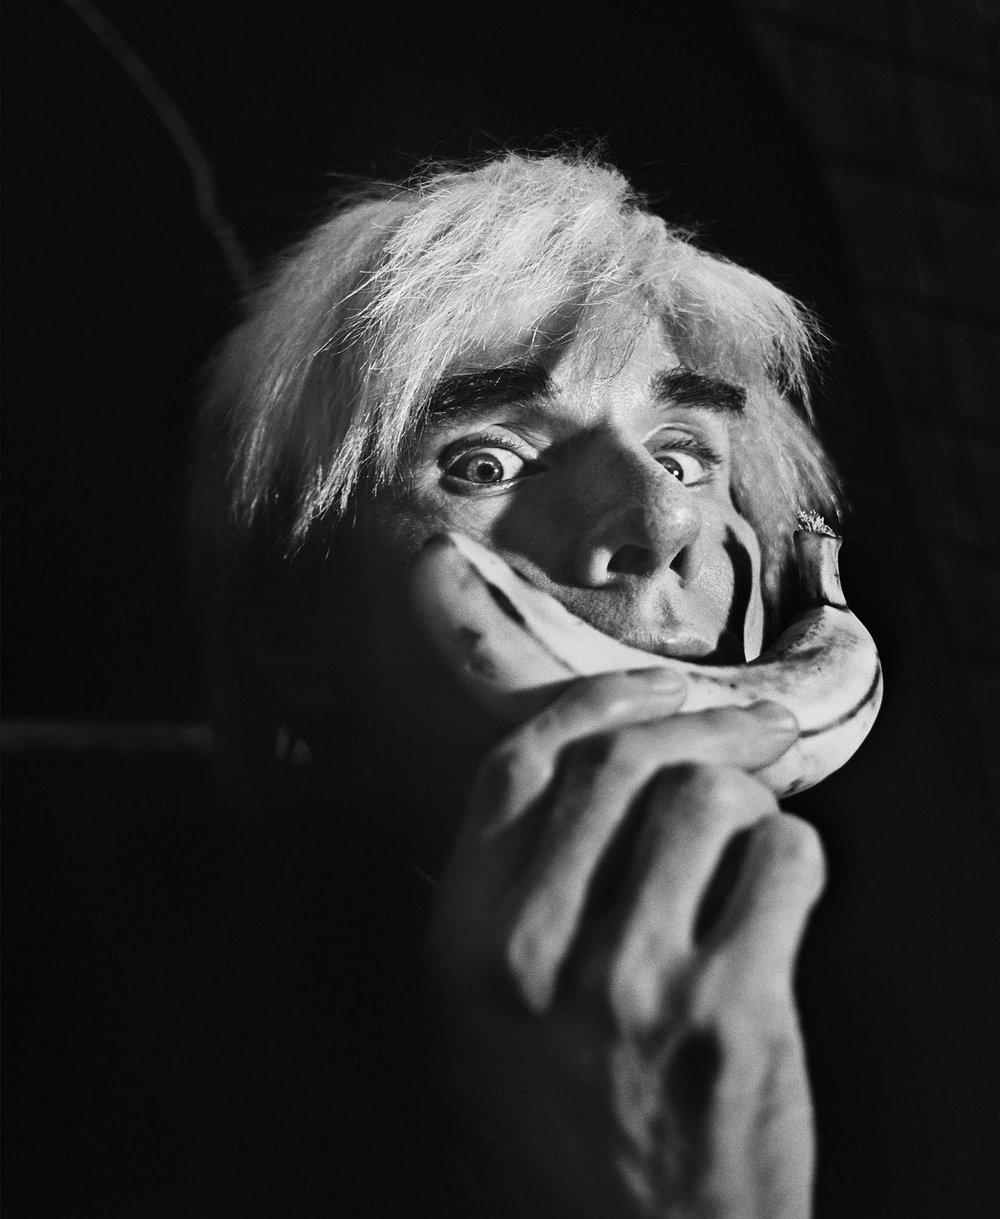 Andy Warhol, New York, 1986